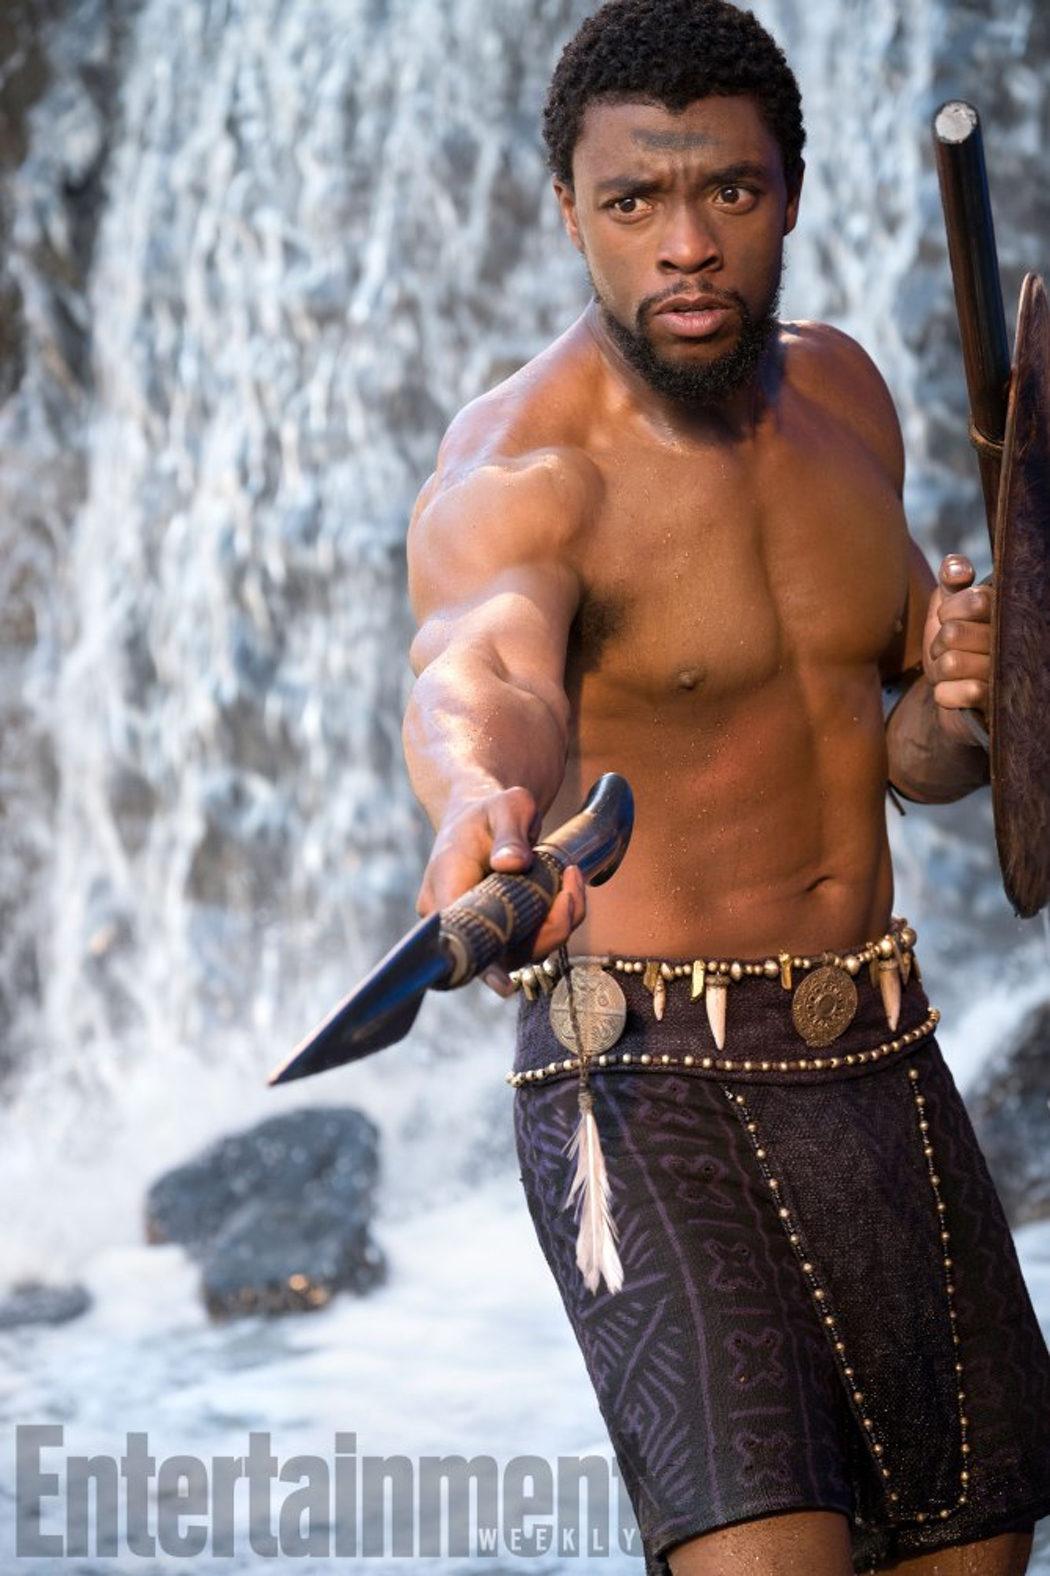 T'Challa, interpretado por Chadwick Boseman